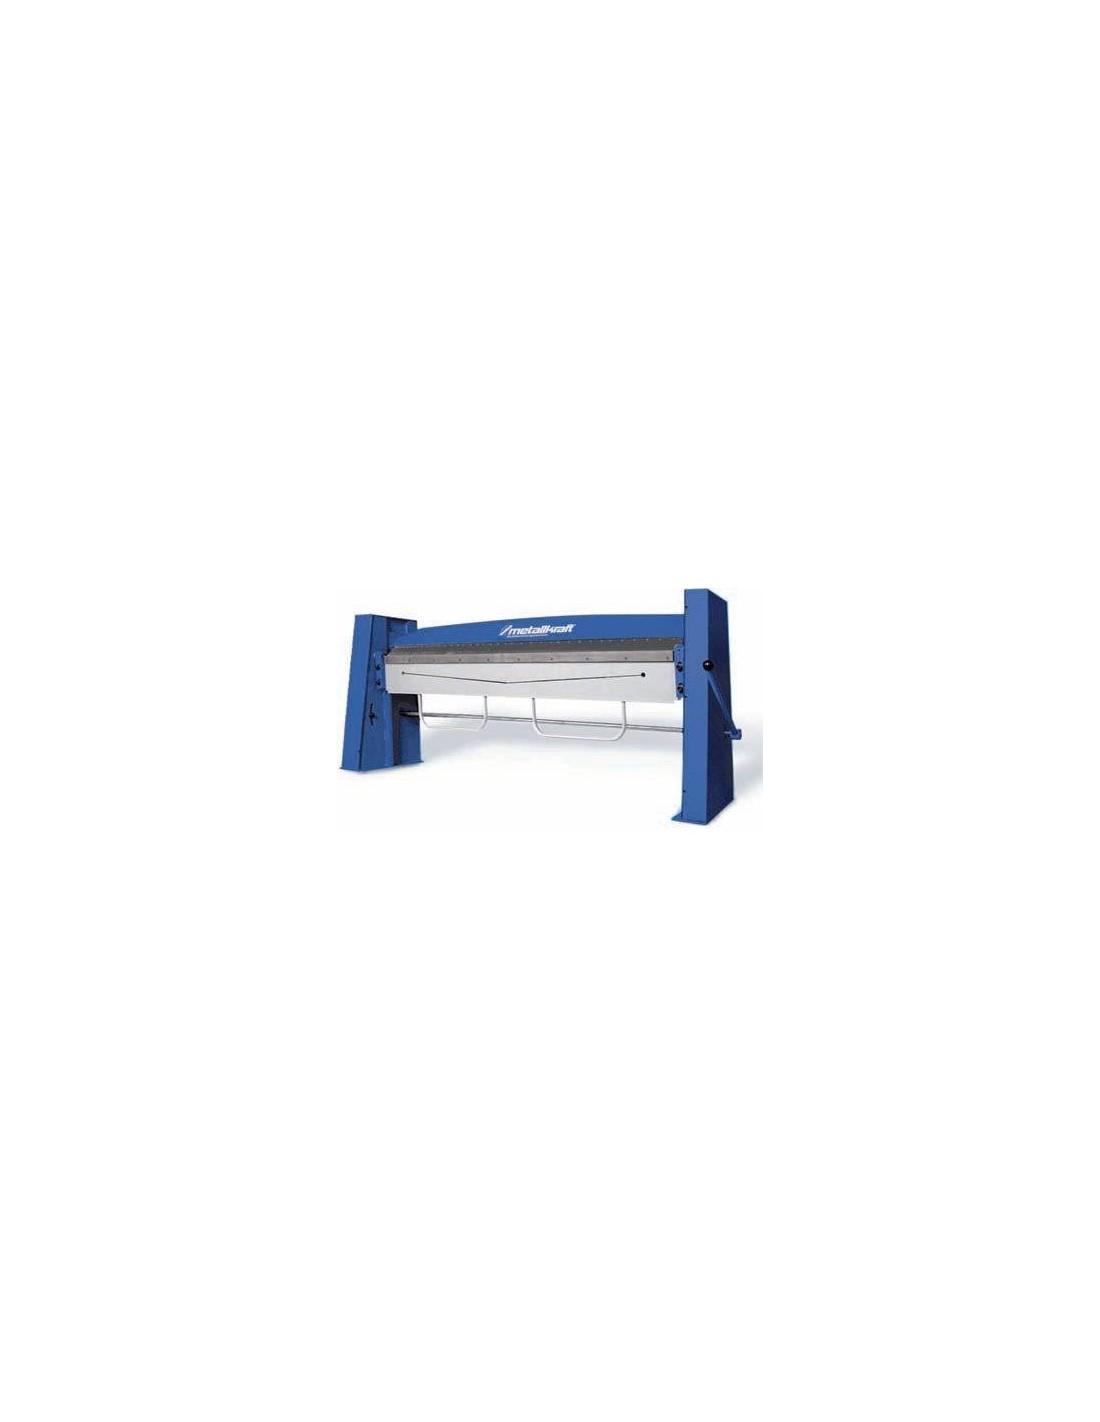 Abkant manual cu lama ascutita Metallkraft HSBM 1520-25